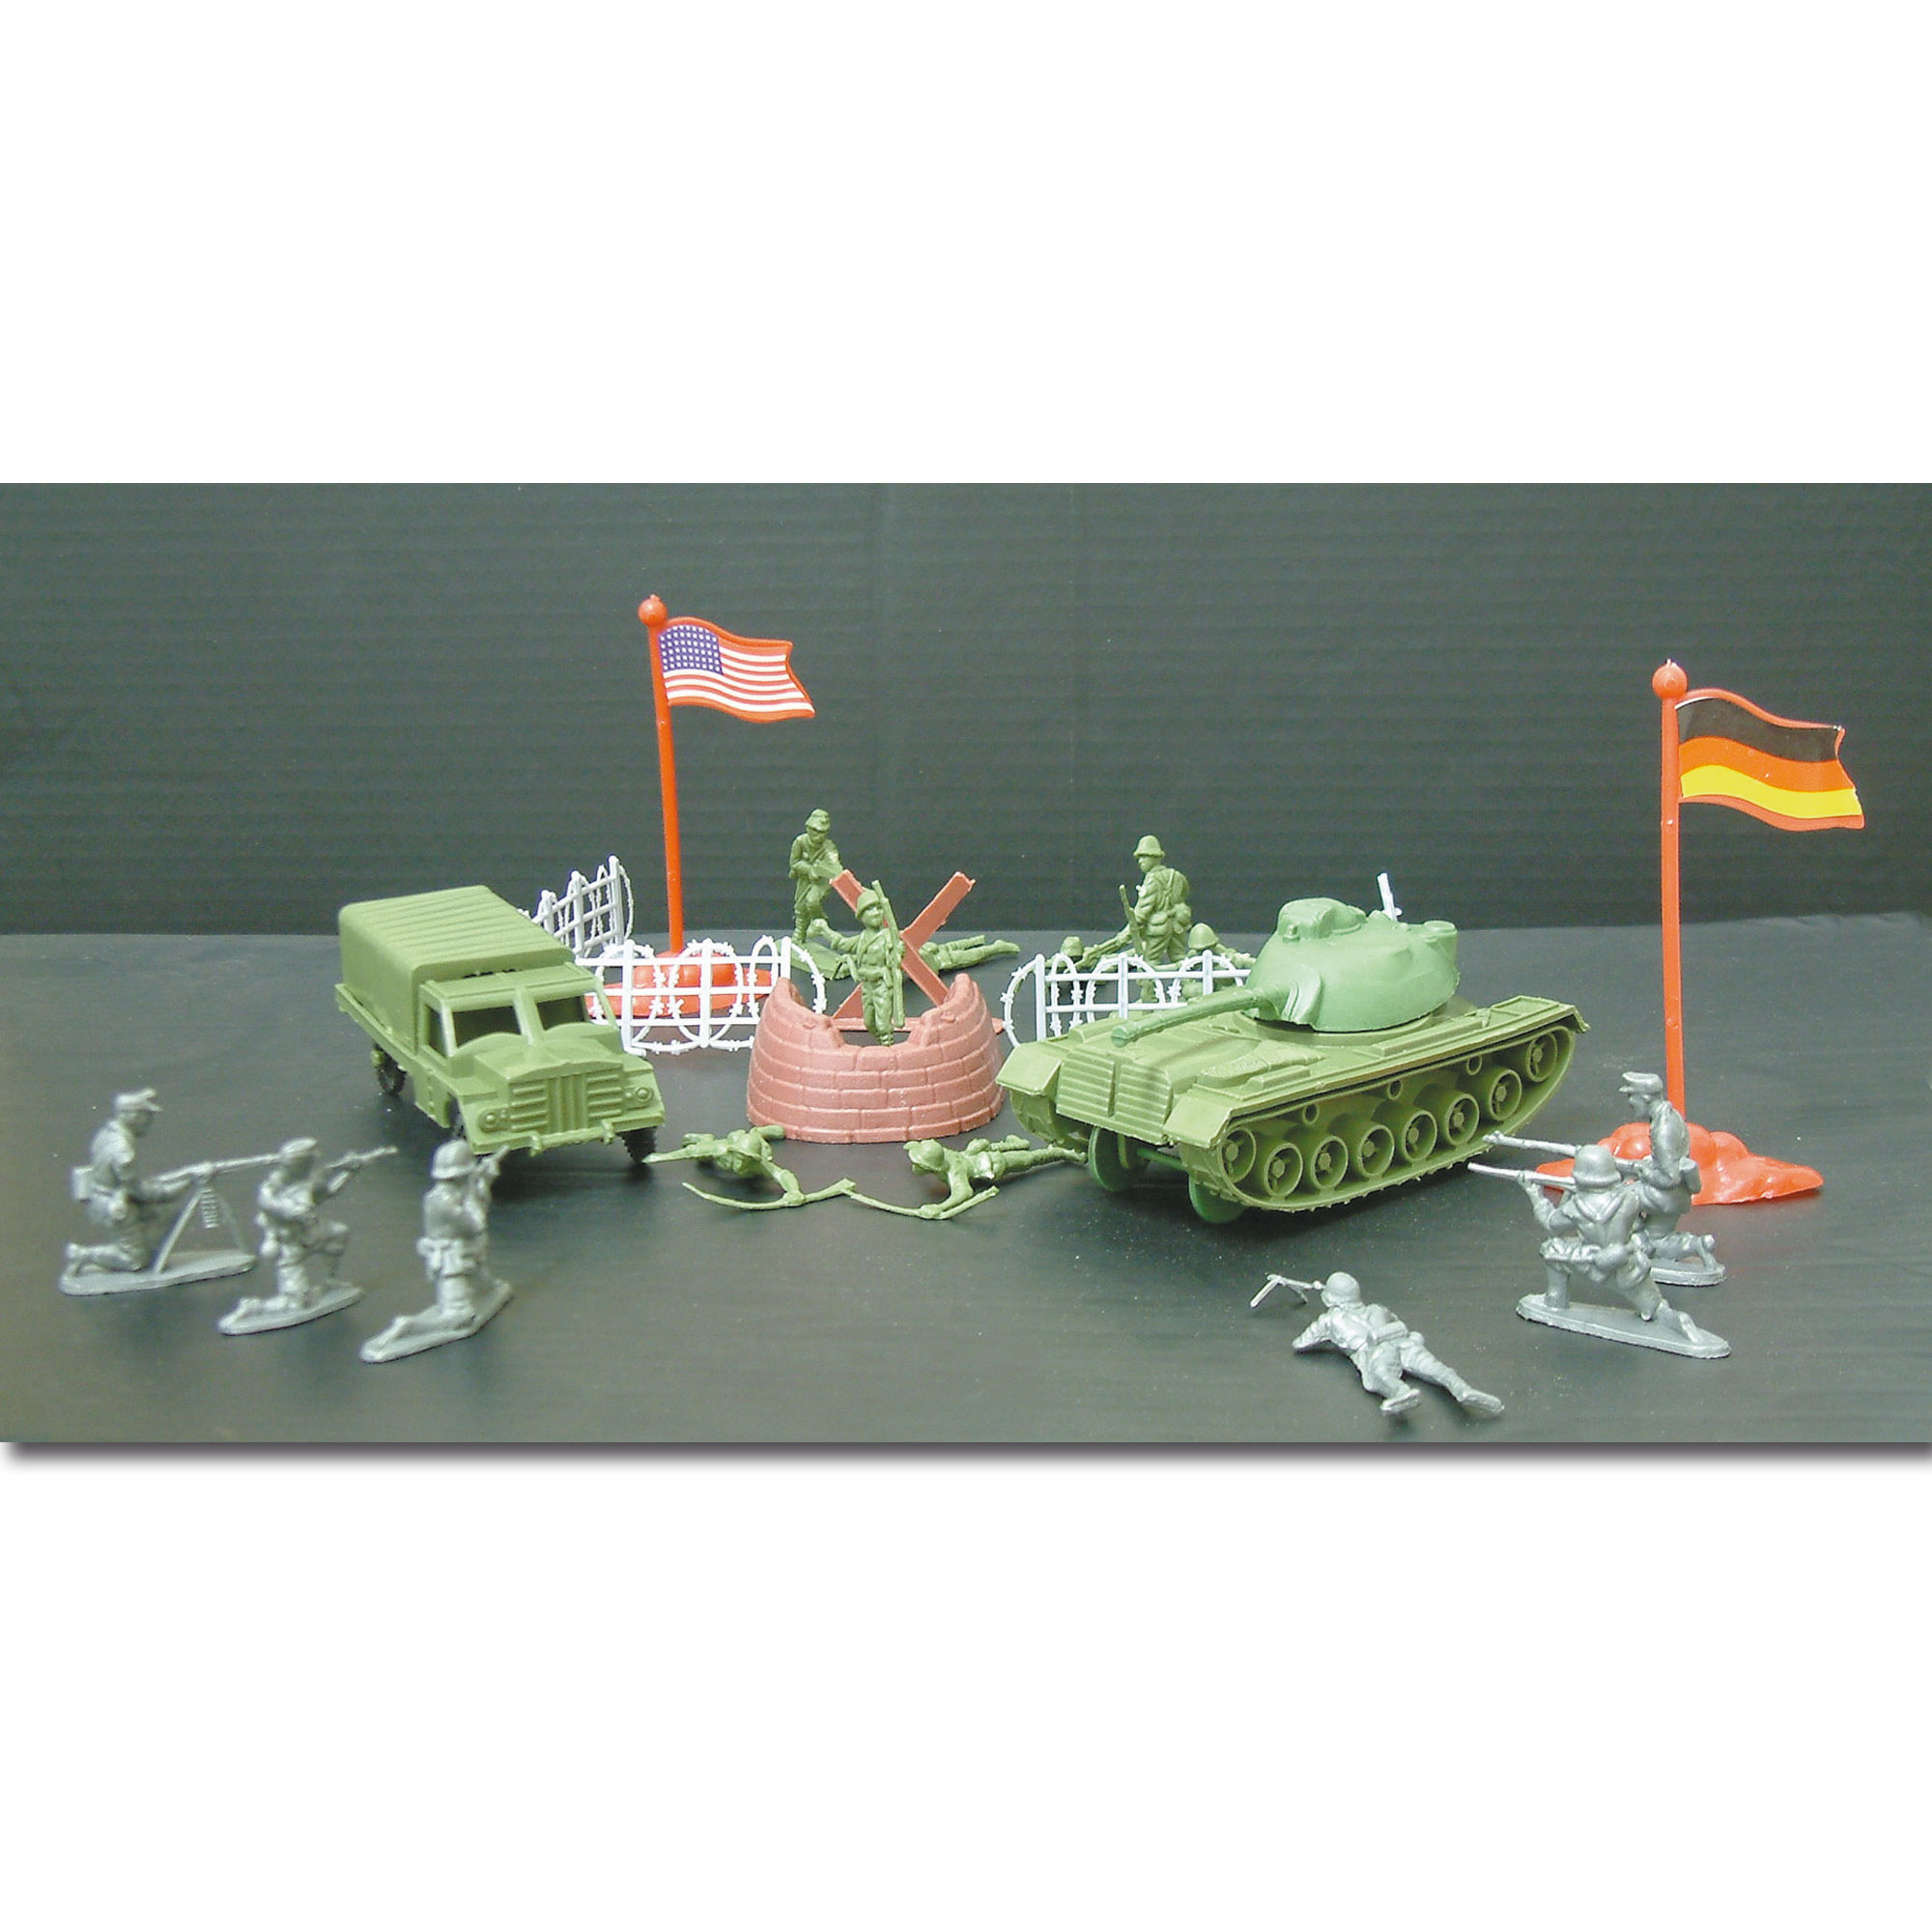 Soldaten Spielzeugsatz